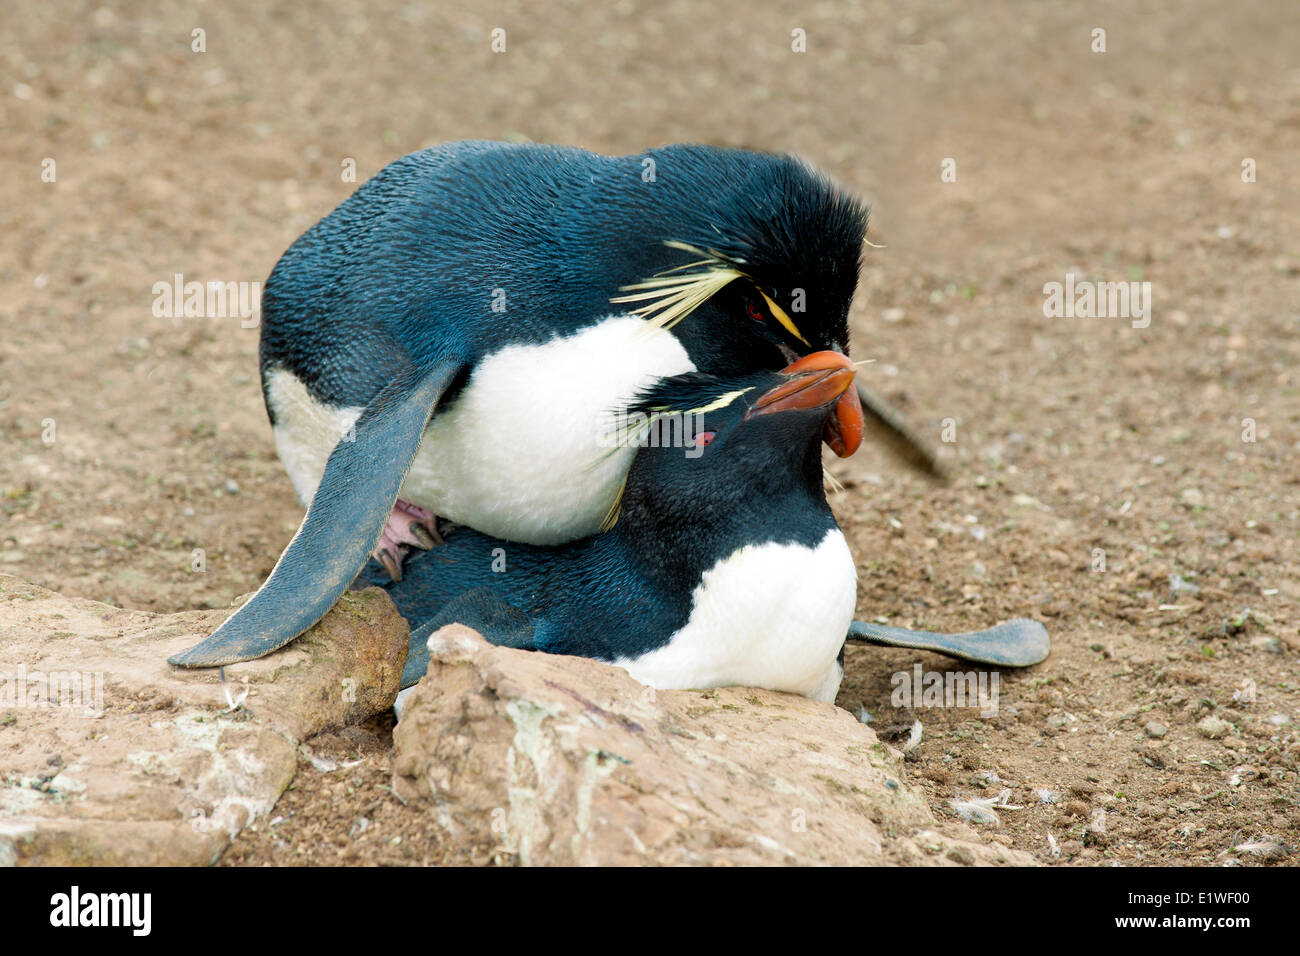 Mating rockhopper penguins (Eudyptes chrysocome), Falkland Islands, Southern Atlantic Ocean - Stock Image